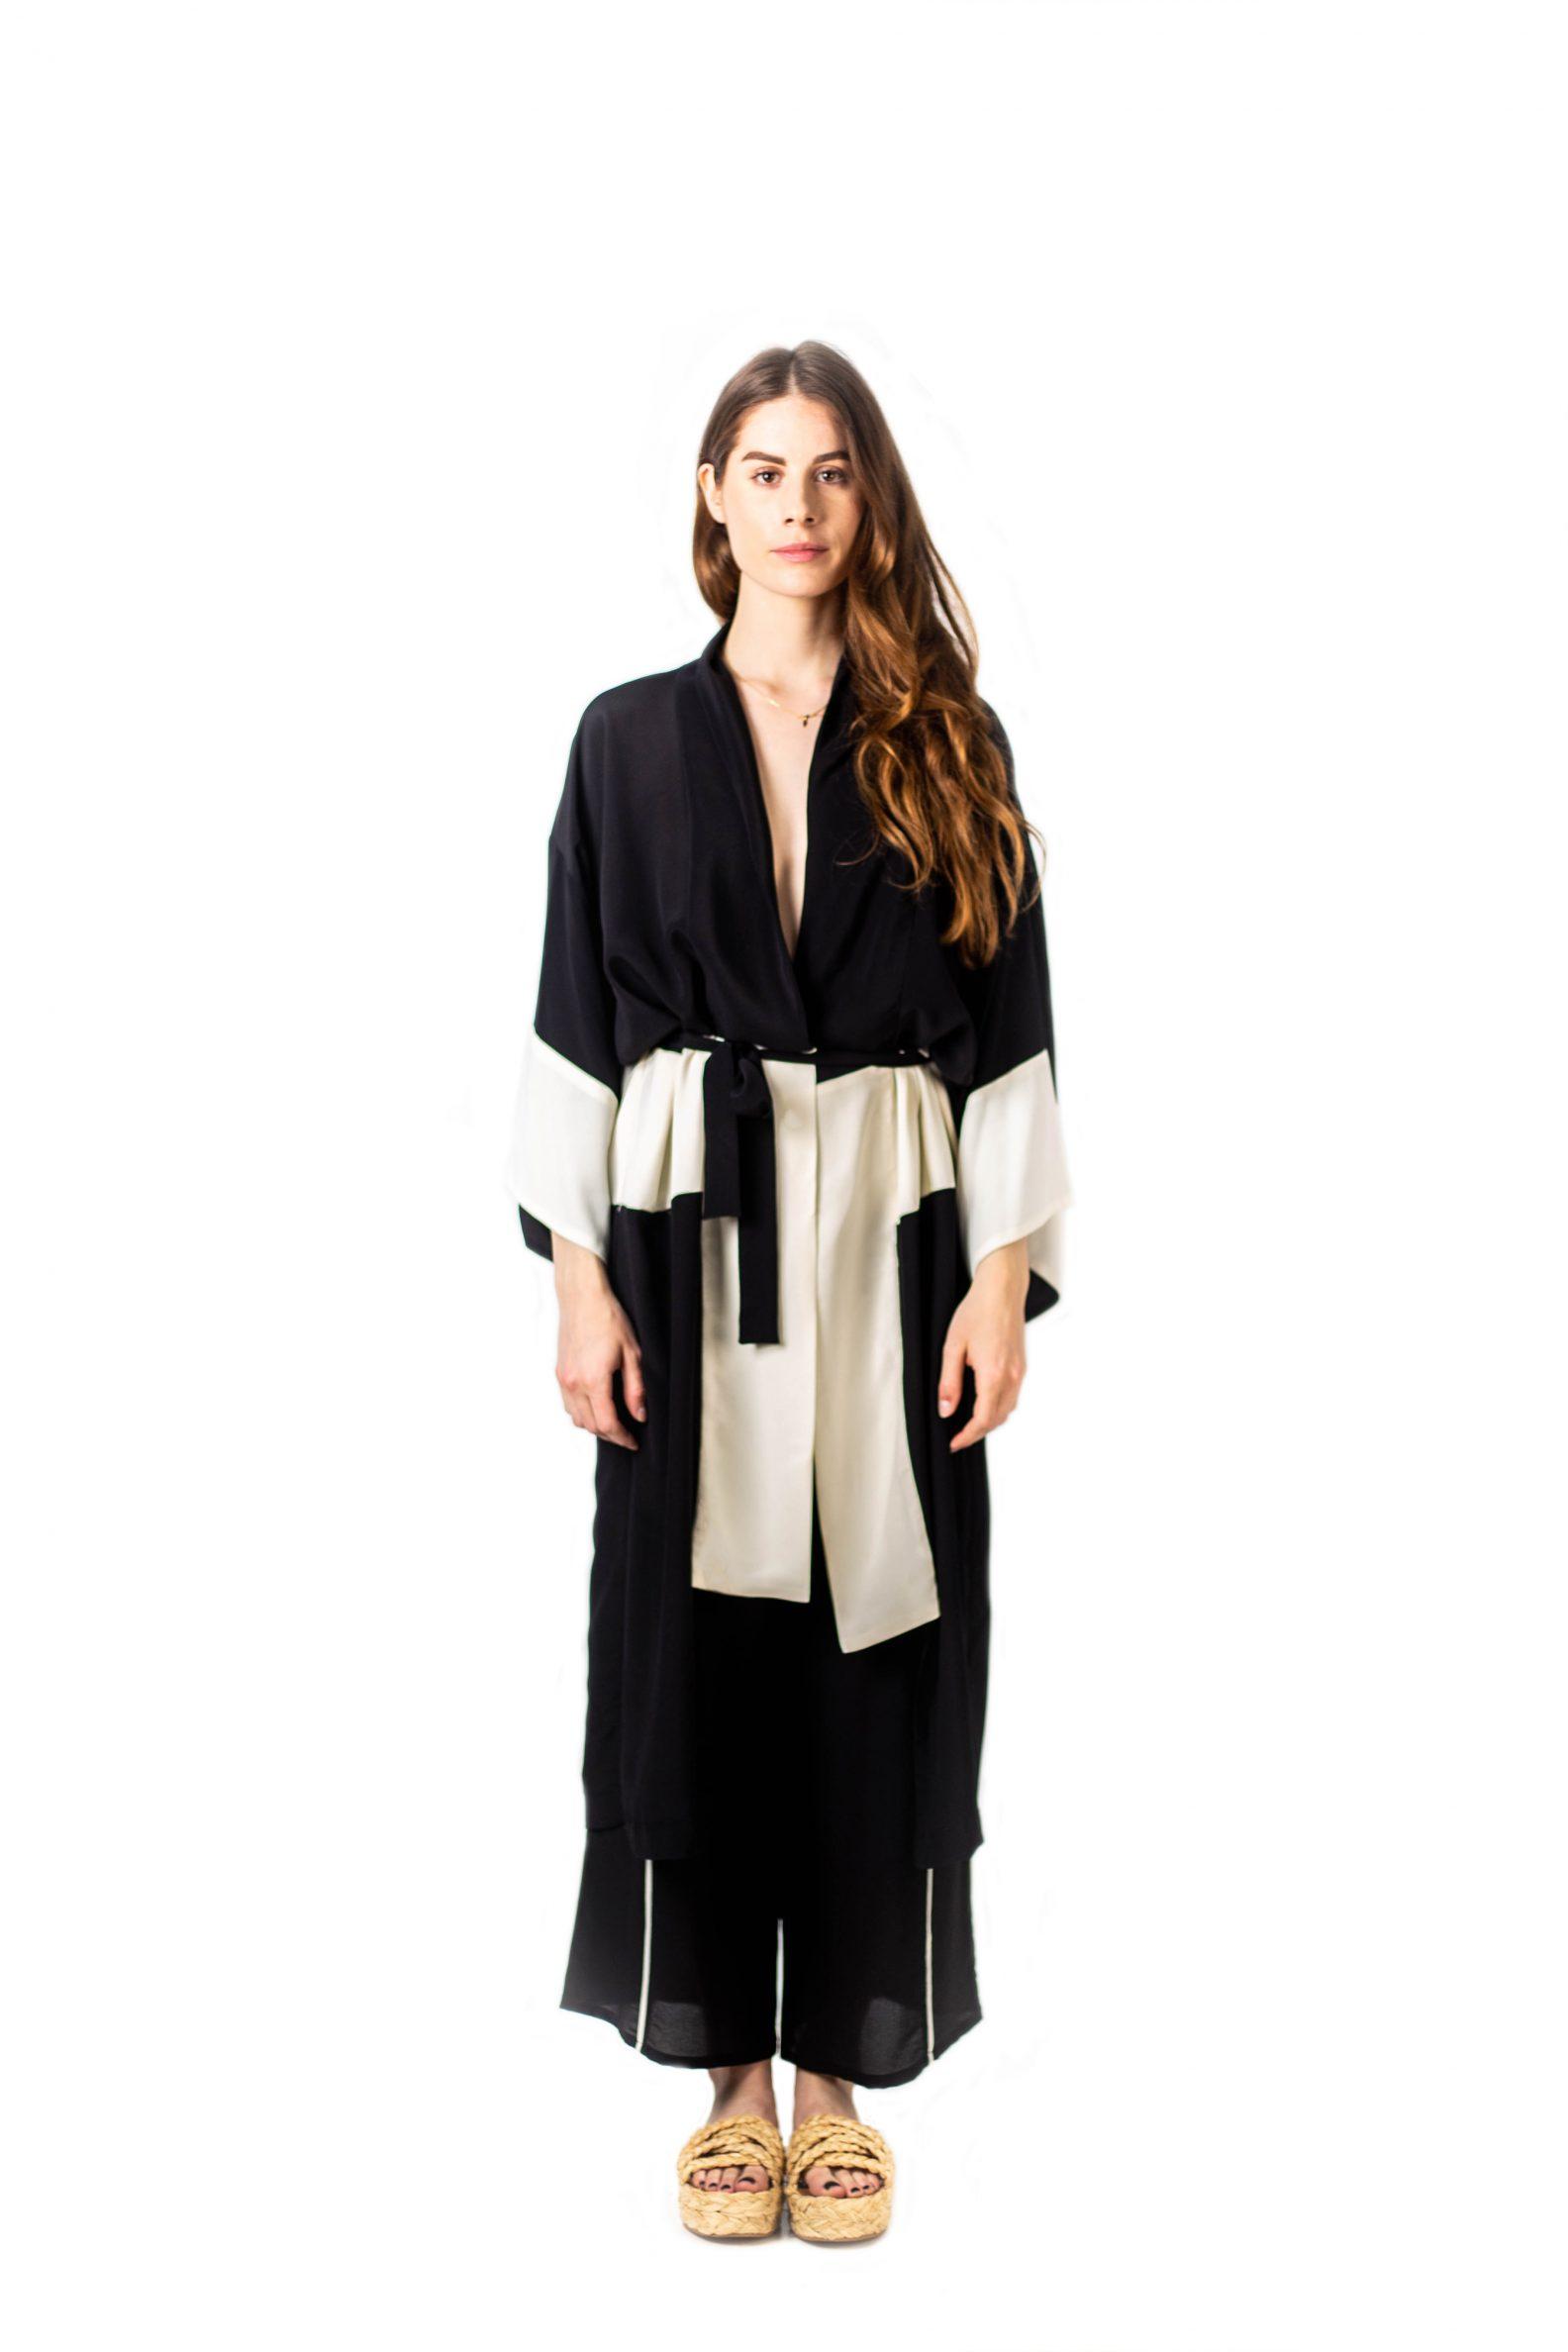 affaires-etrangeres-kimono-long-crepe-soie-tremblepierre-upcycling